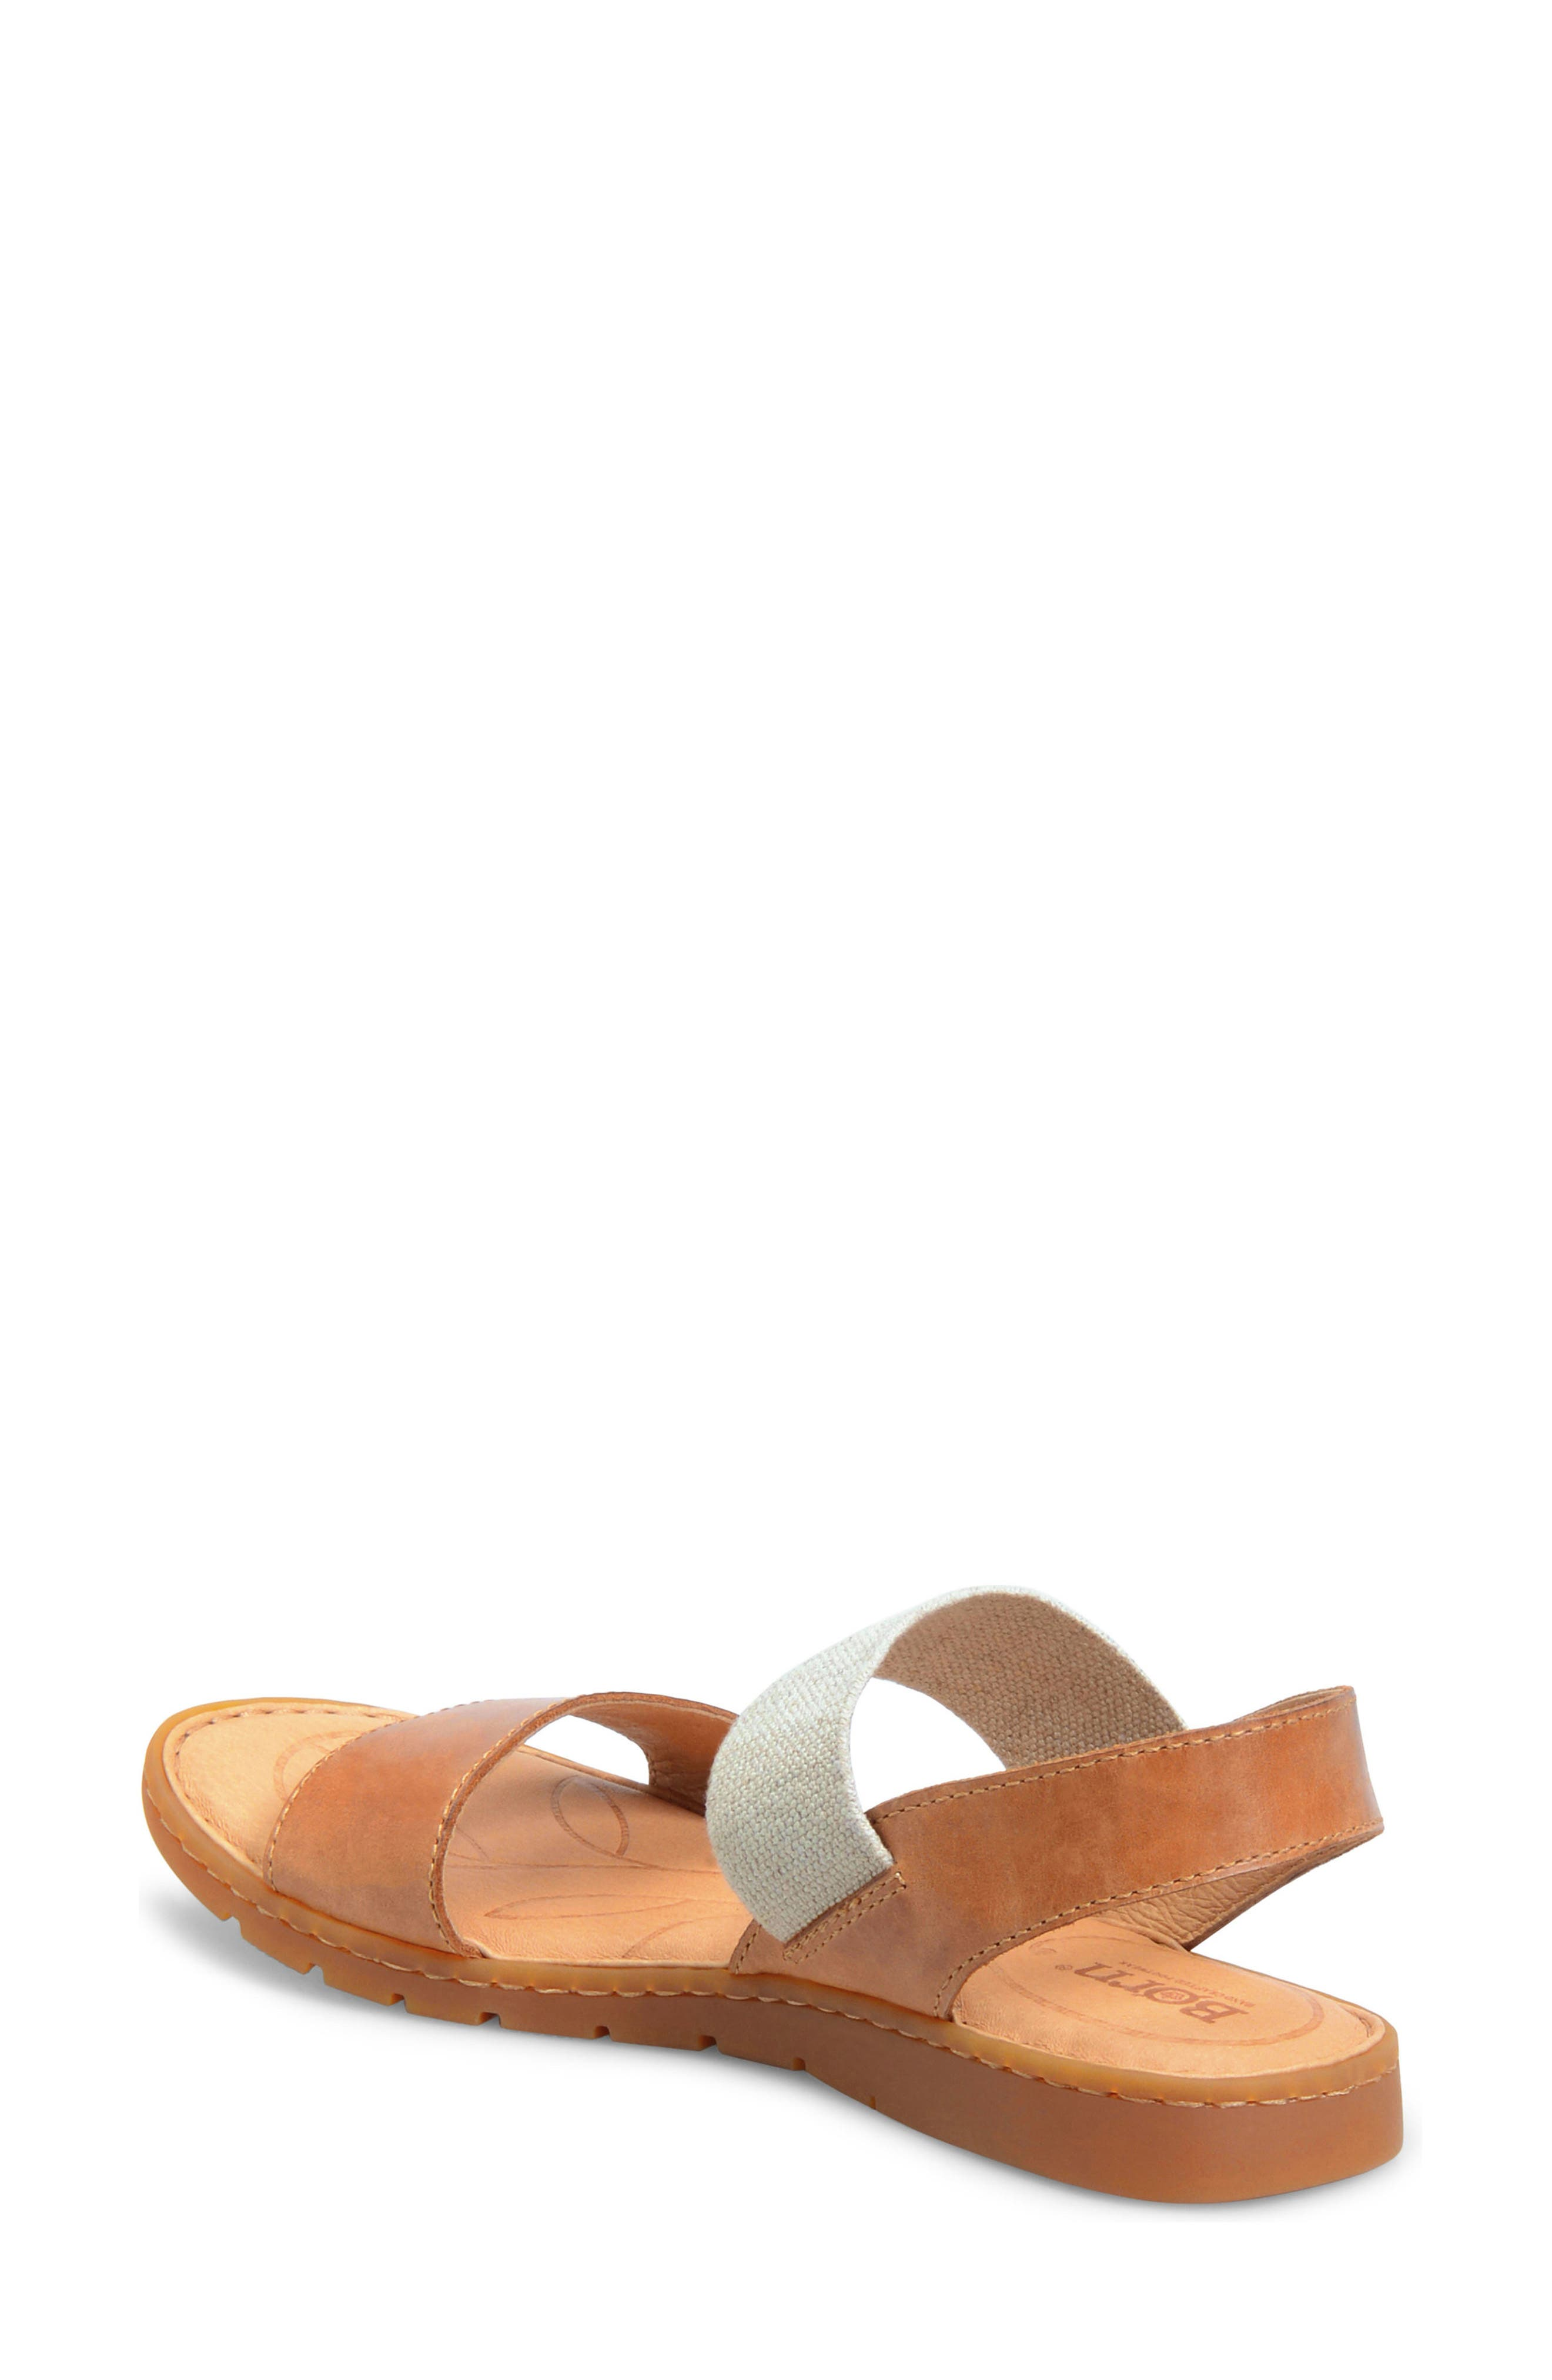 Parsons Sandal,                             Alternate thumbnail 4, color,